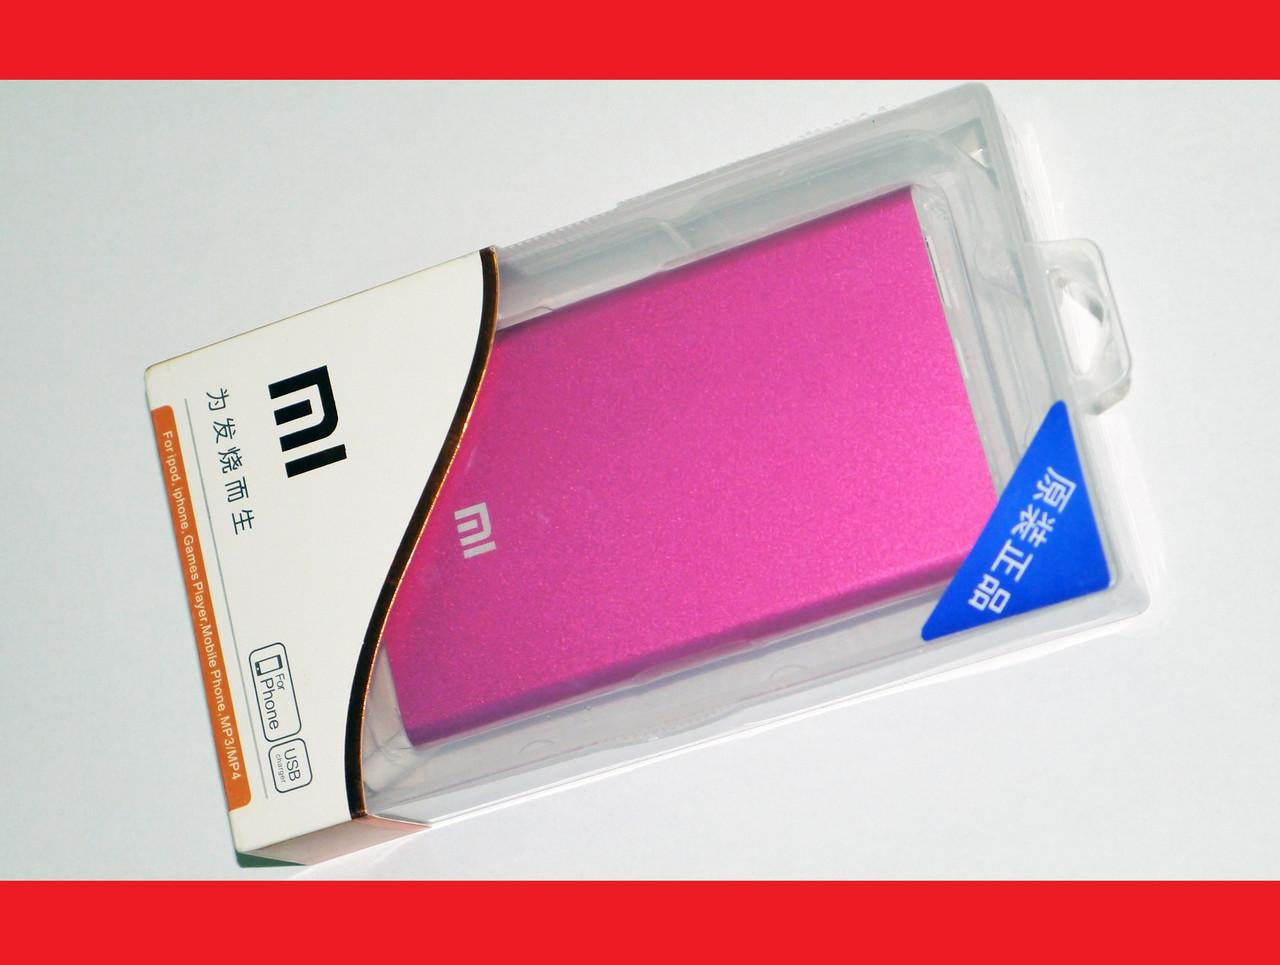 818e0f0c67343 Power Bank Xiaomi Mi 24000 mAh Розовый USB + Металл -